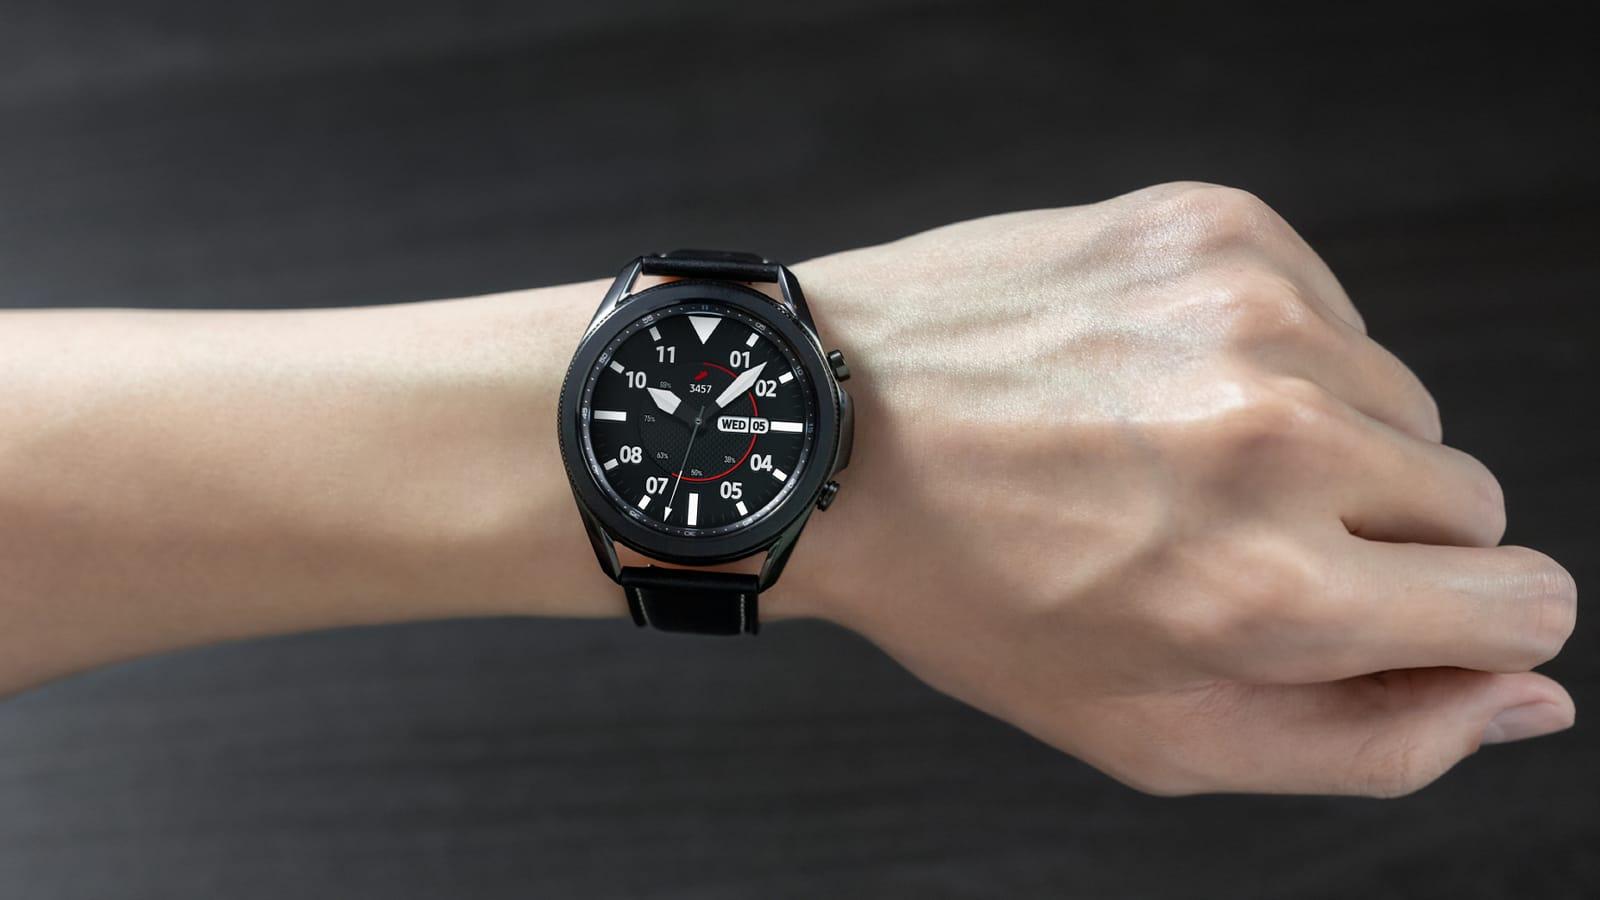 Galaxy Watch 3 Black Version